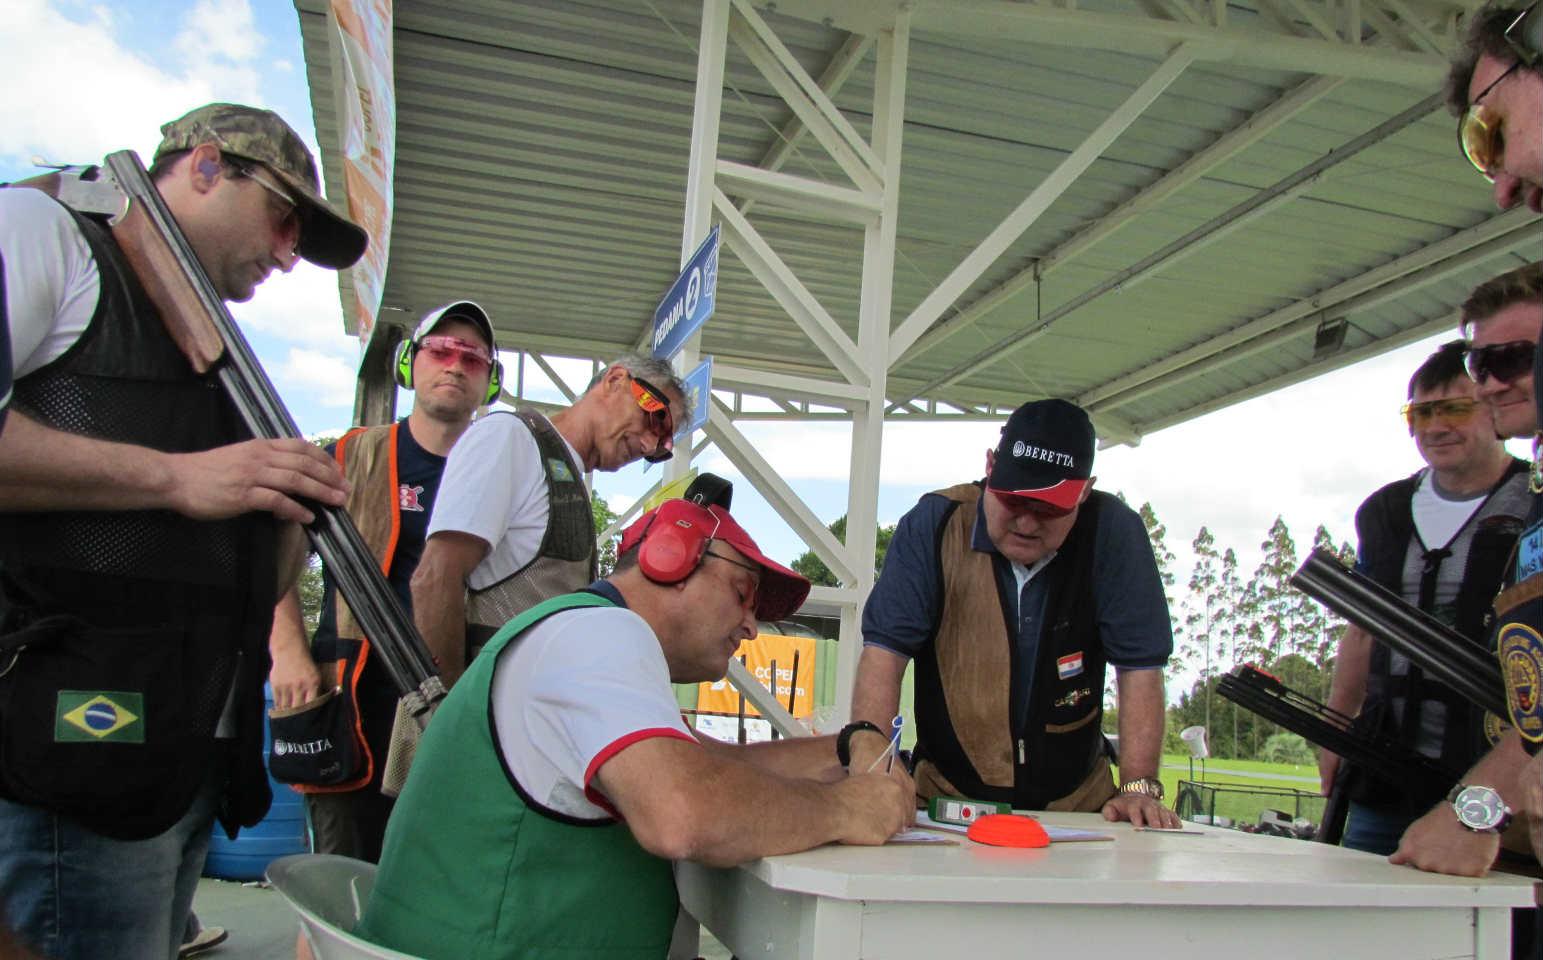 Playoff da Liga Nacional de Trap Americano 2017 - Tiro esportivo